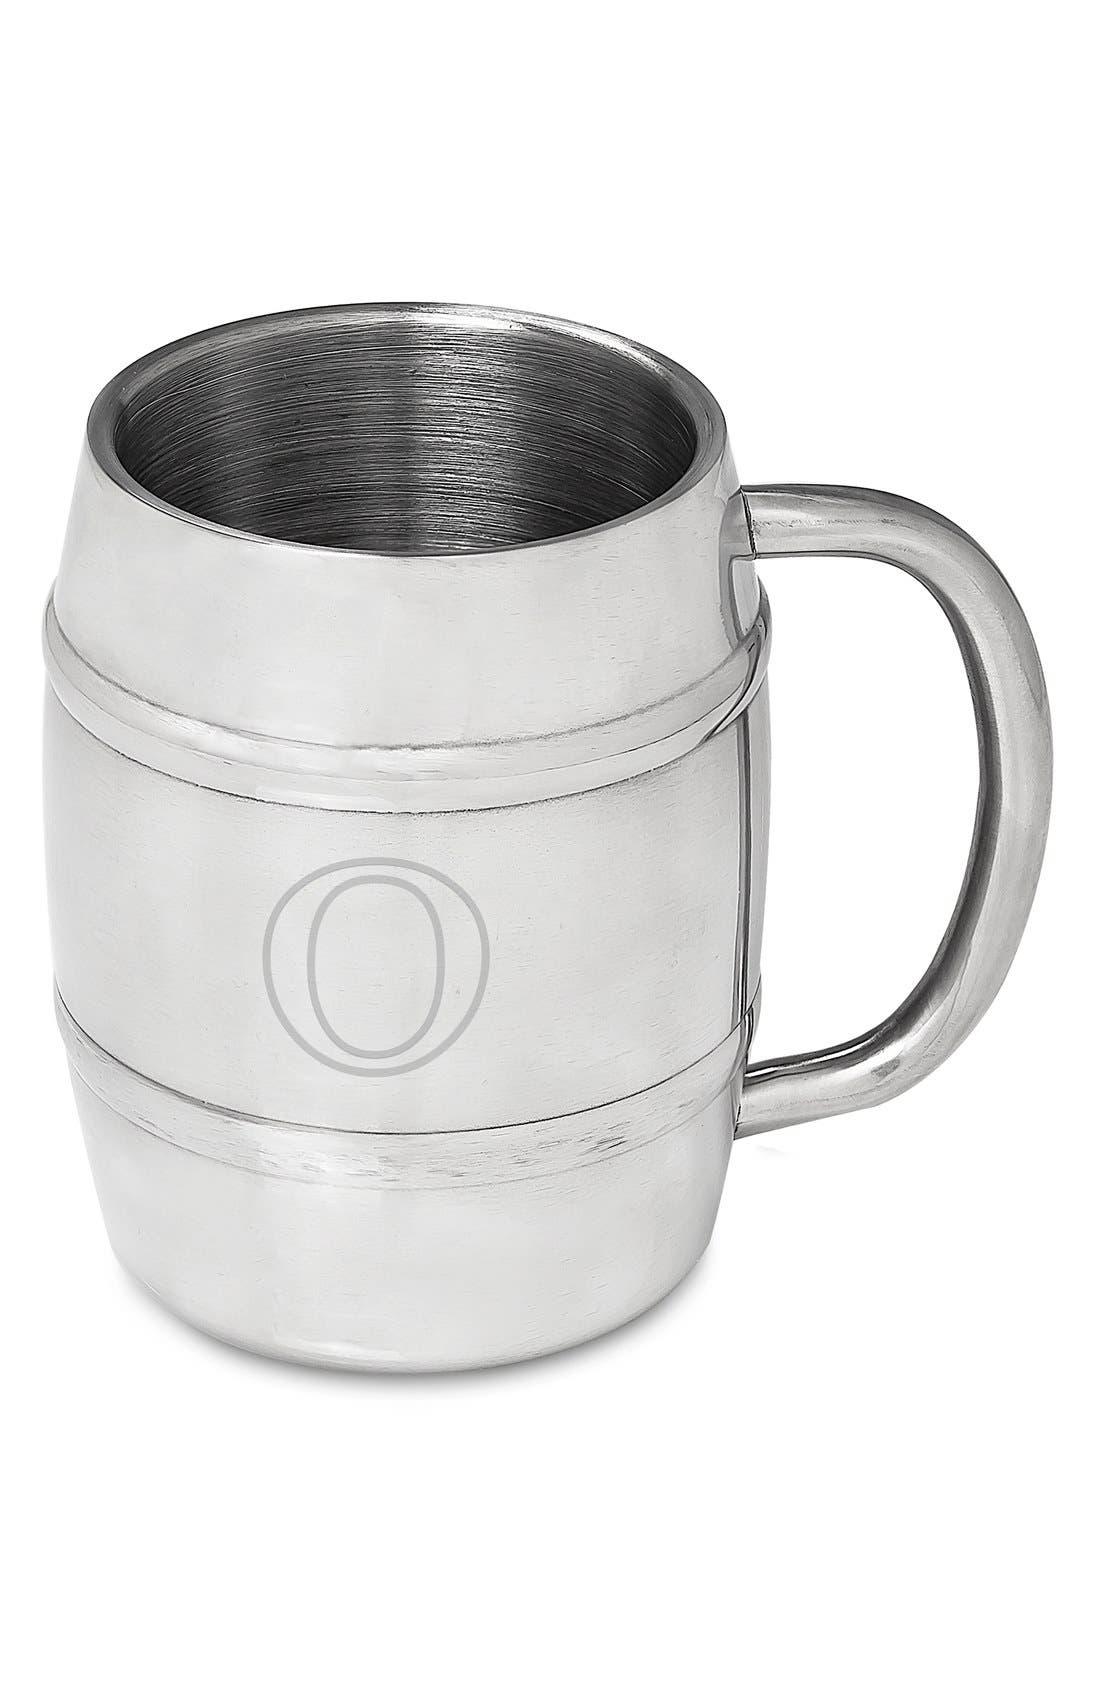 Monogram Stainless Steel Keg Mug,                             Main thumbnail 17, color,